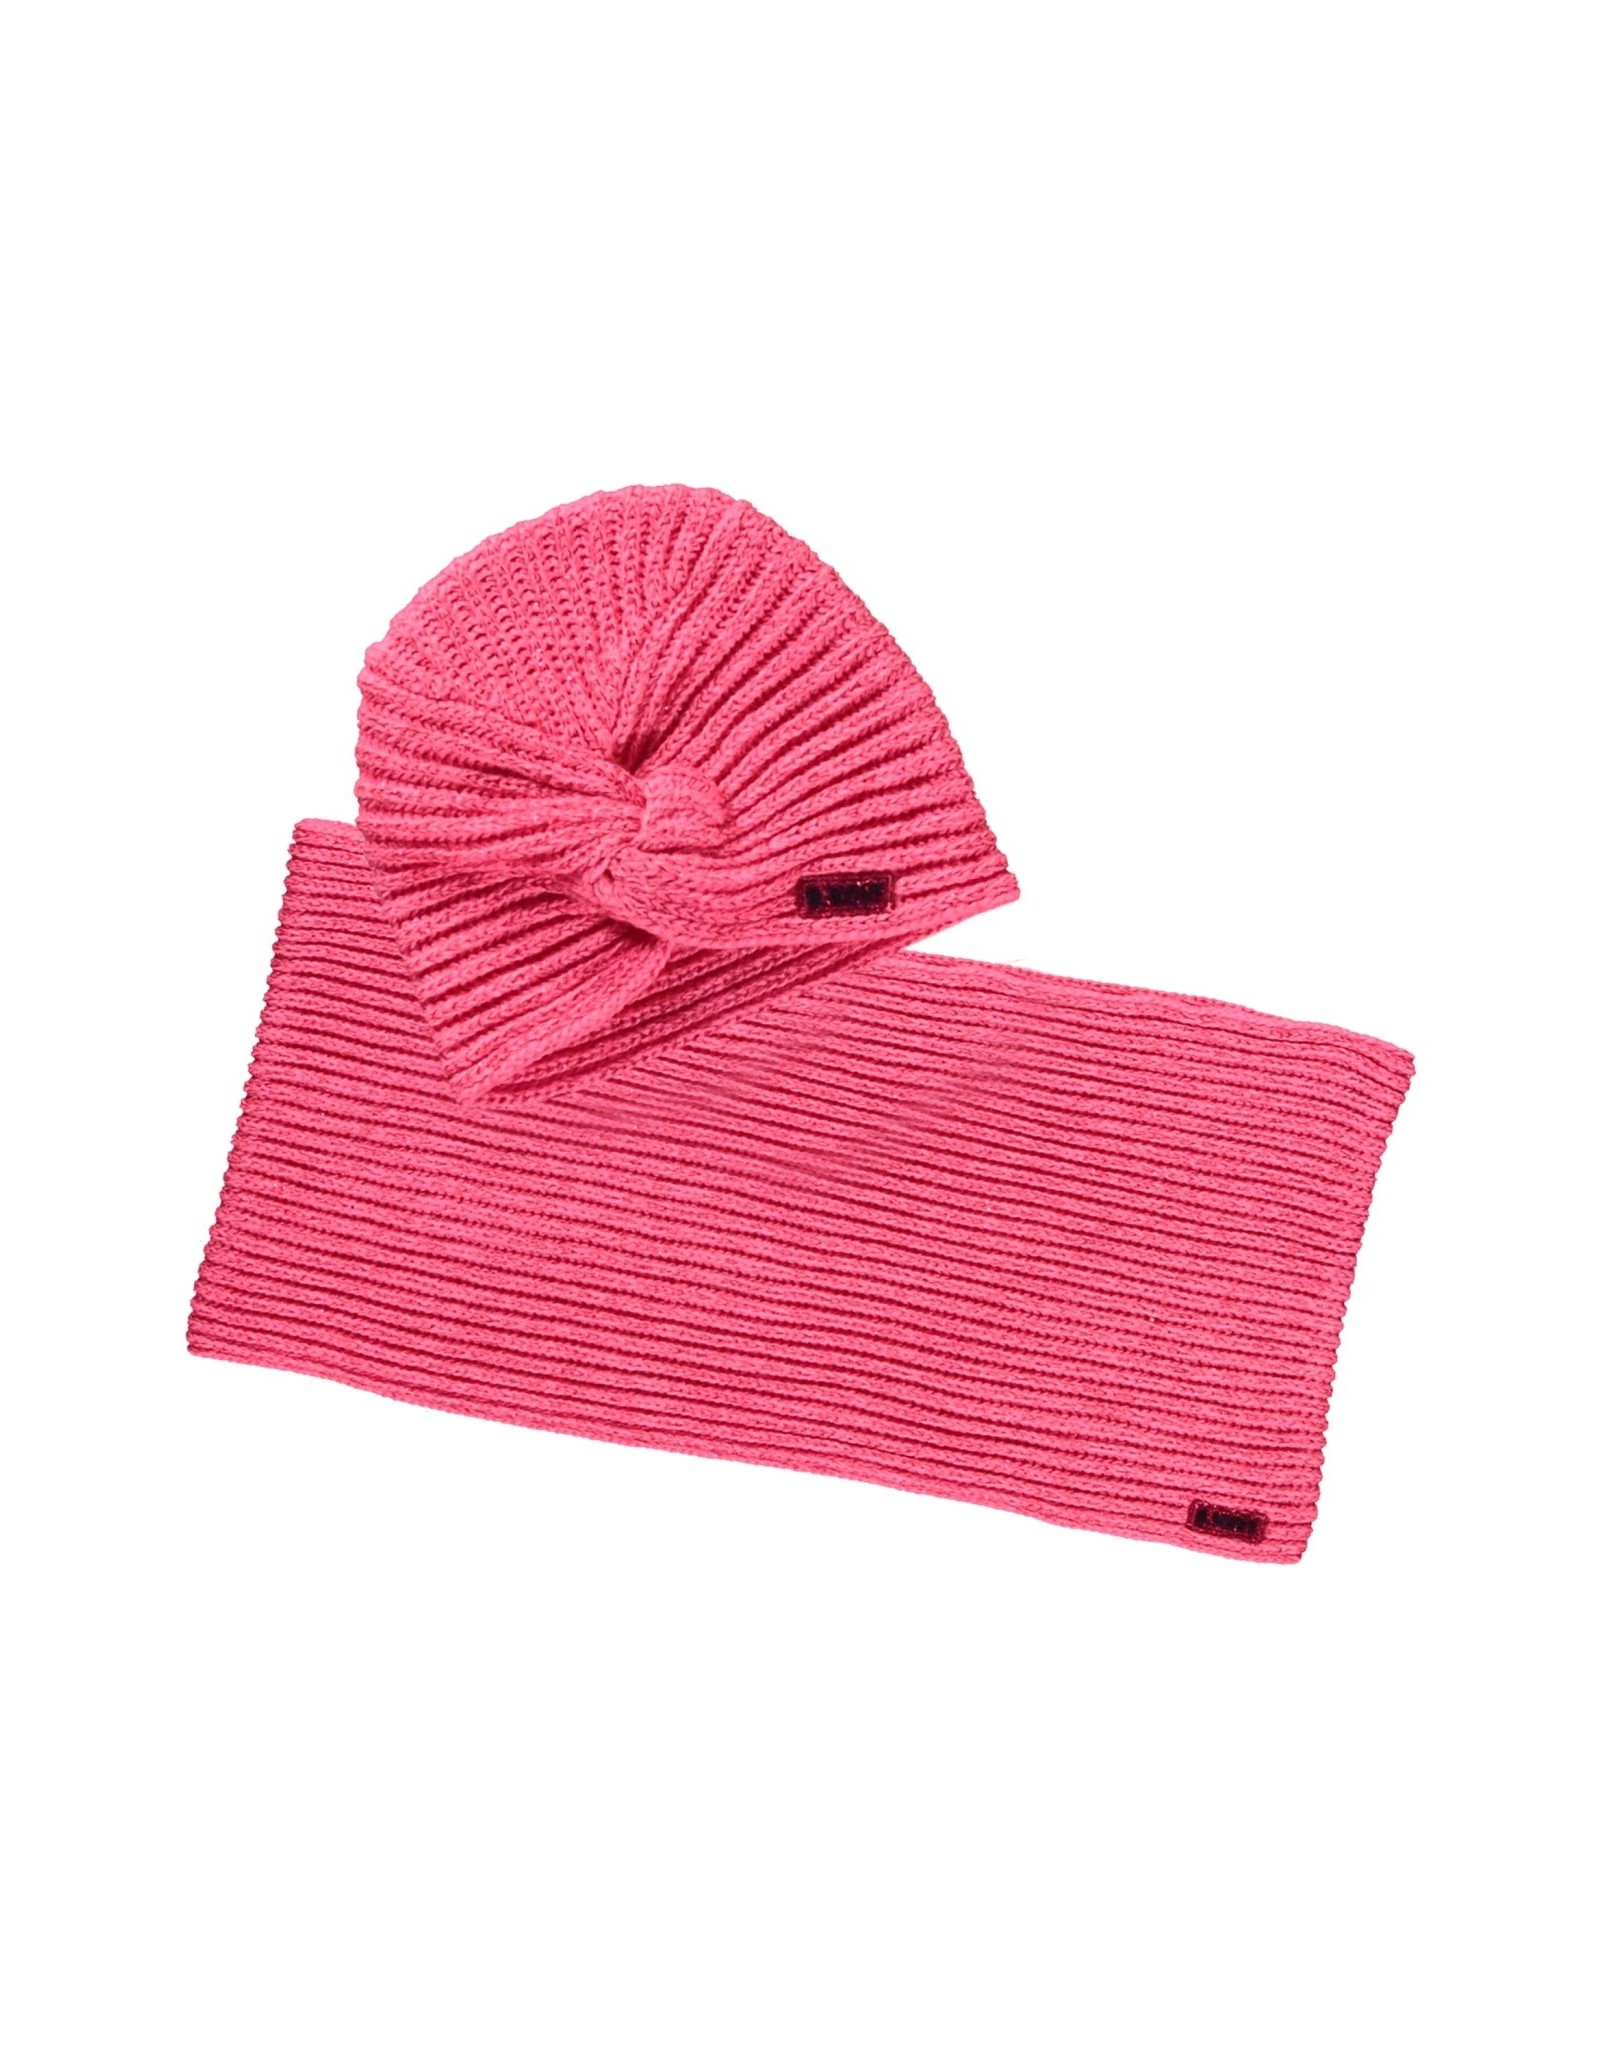 B.Nosy B.Nosy meisjes sjaal en muts met glitter Shocking Pink